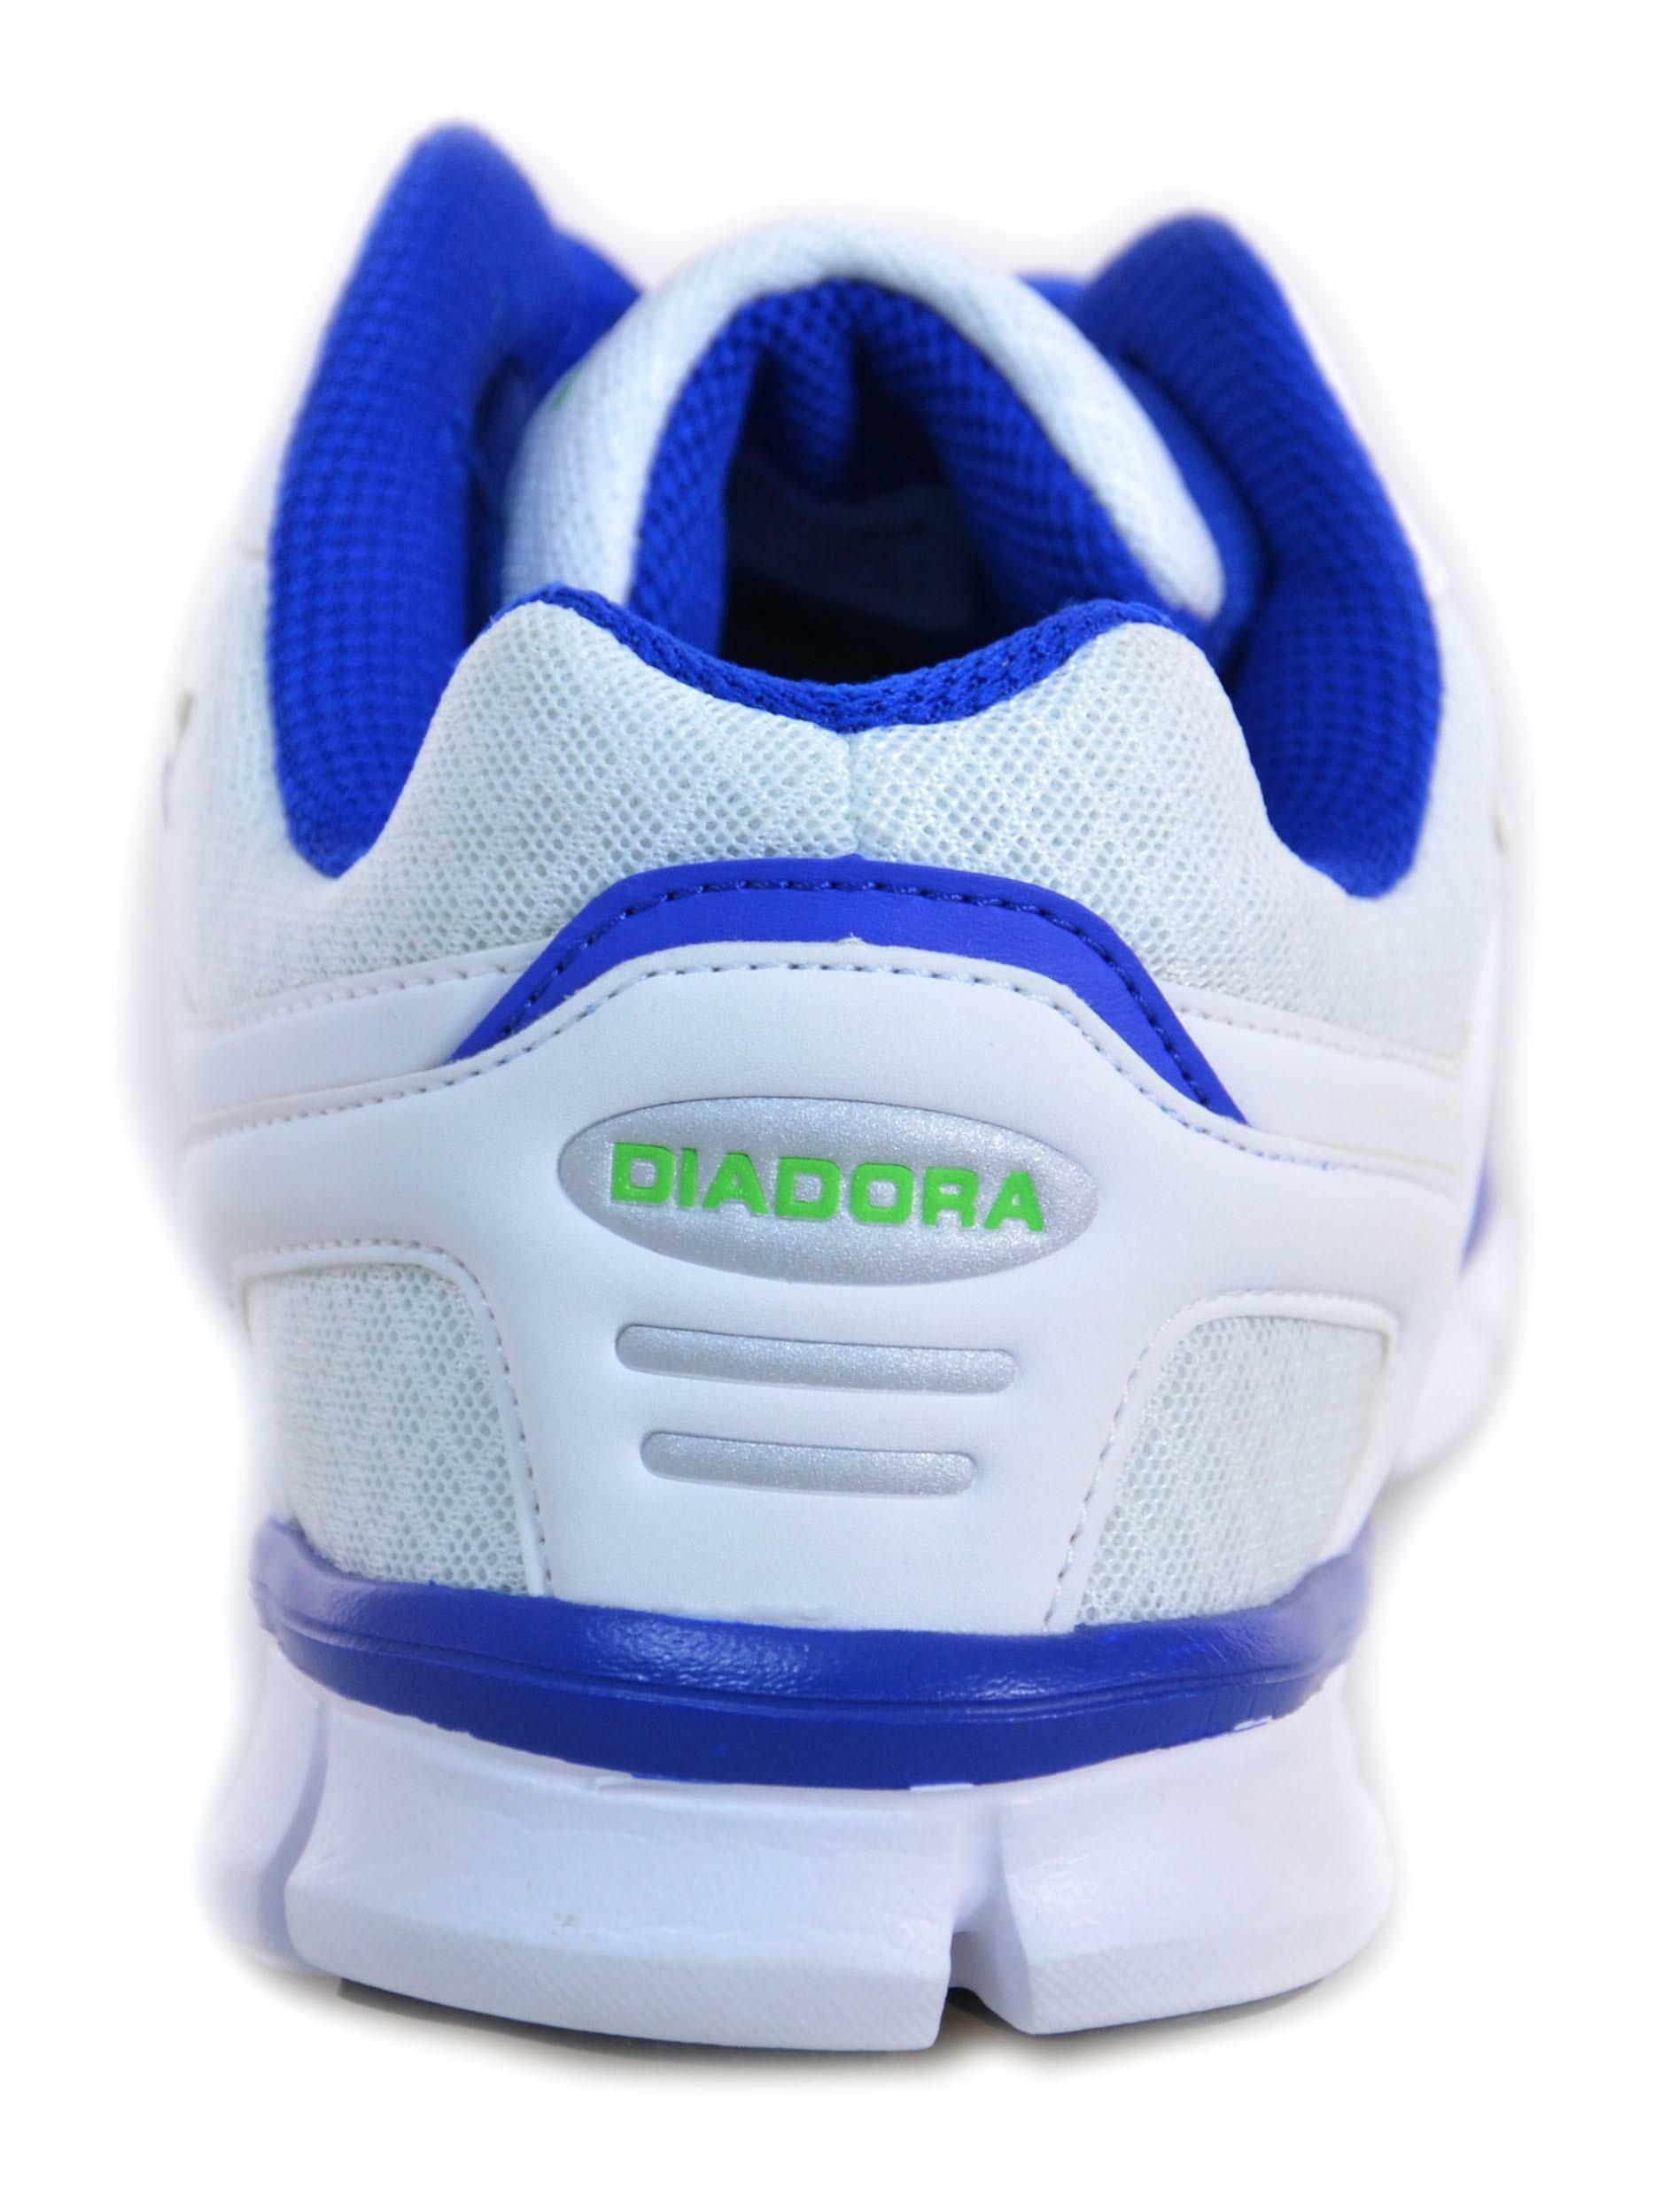 diadora diadora hawk scarpe bianche pelle tela 158981